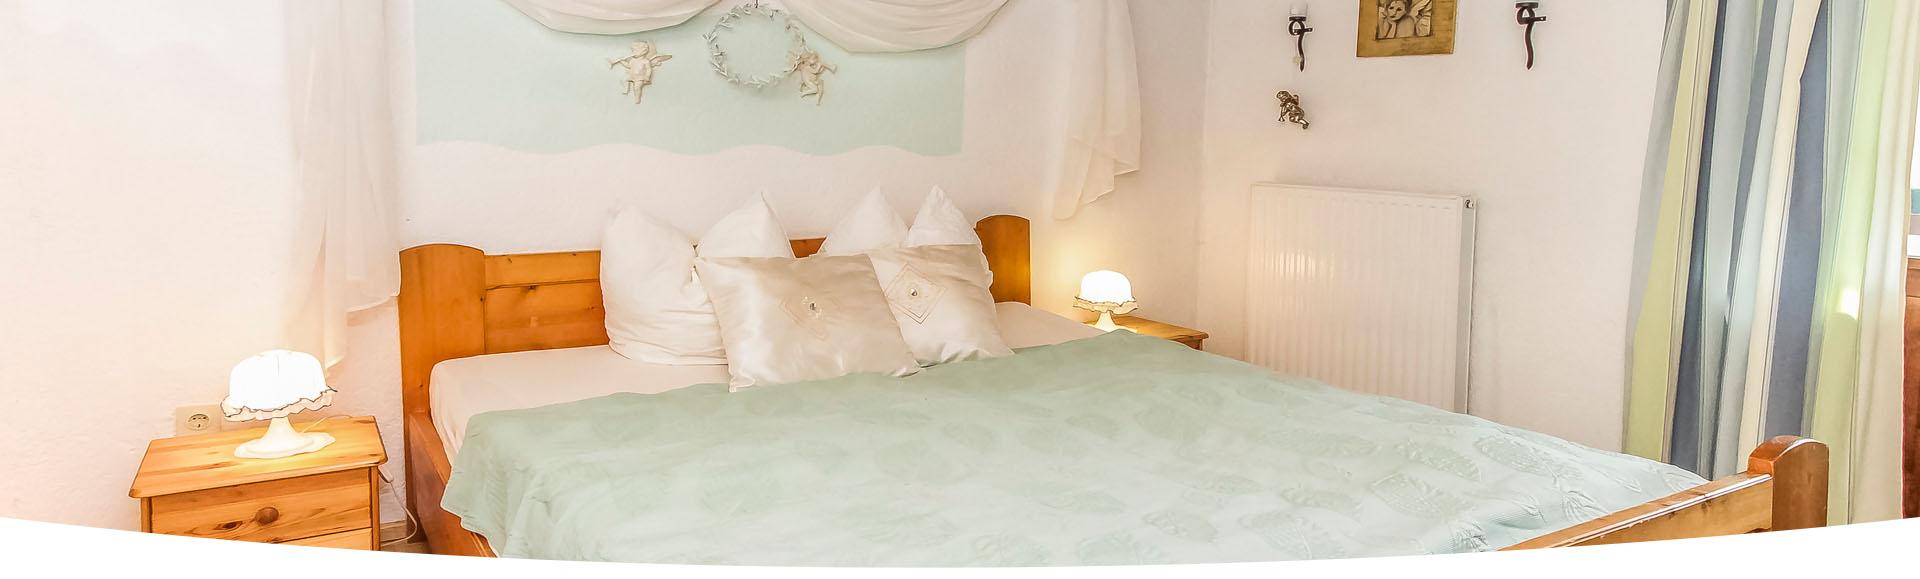 ferienwohnung schmittenh he in niedernsill. Black Bedroom Furniture Sets. Home Design Ideas